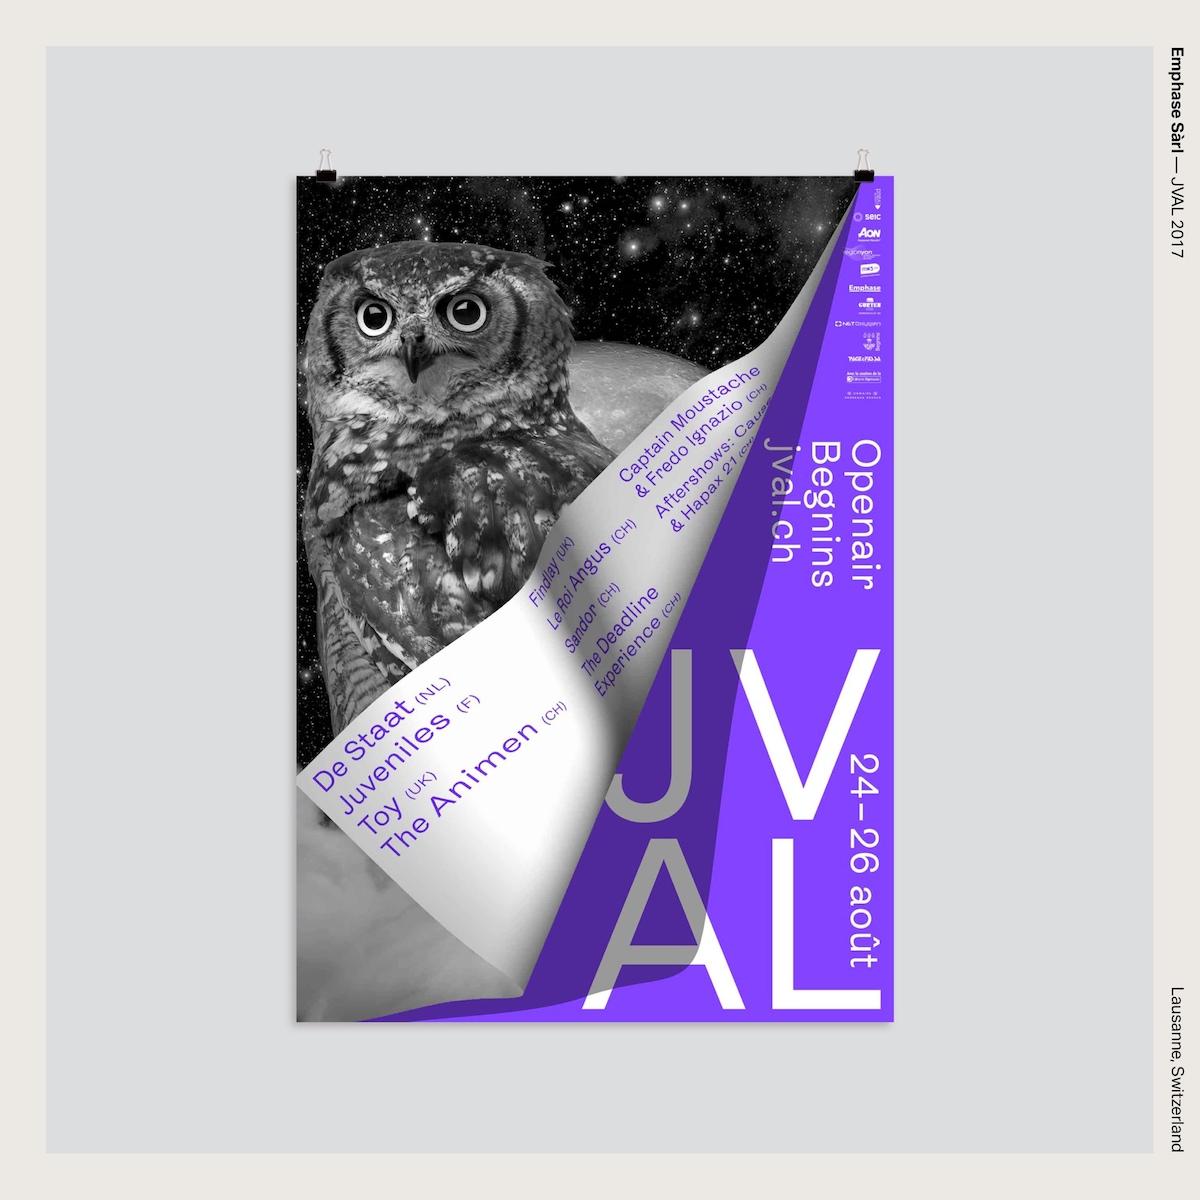 Emphase Sàrl — JVAL 2017